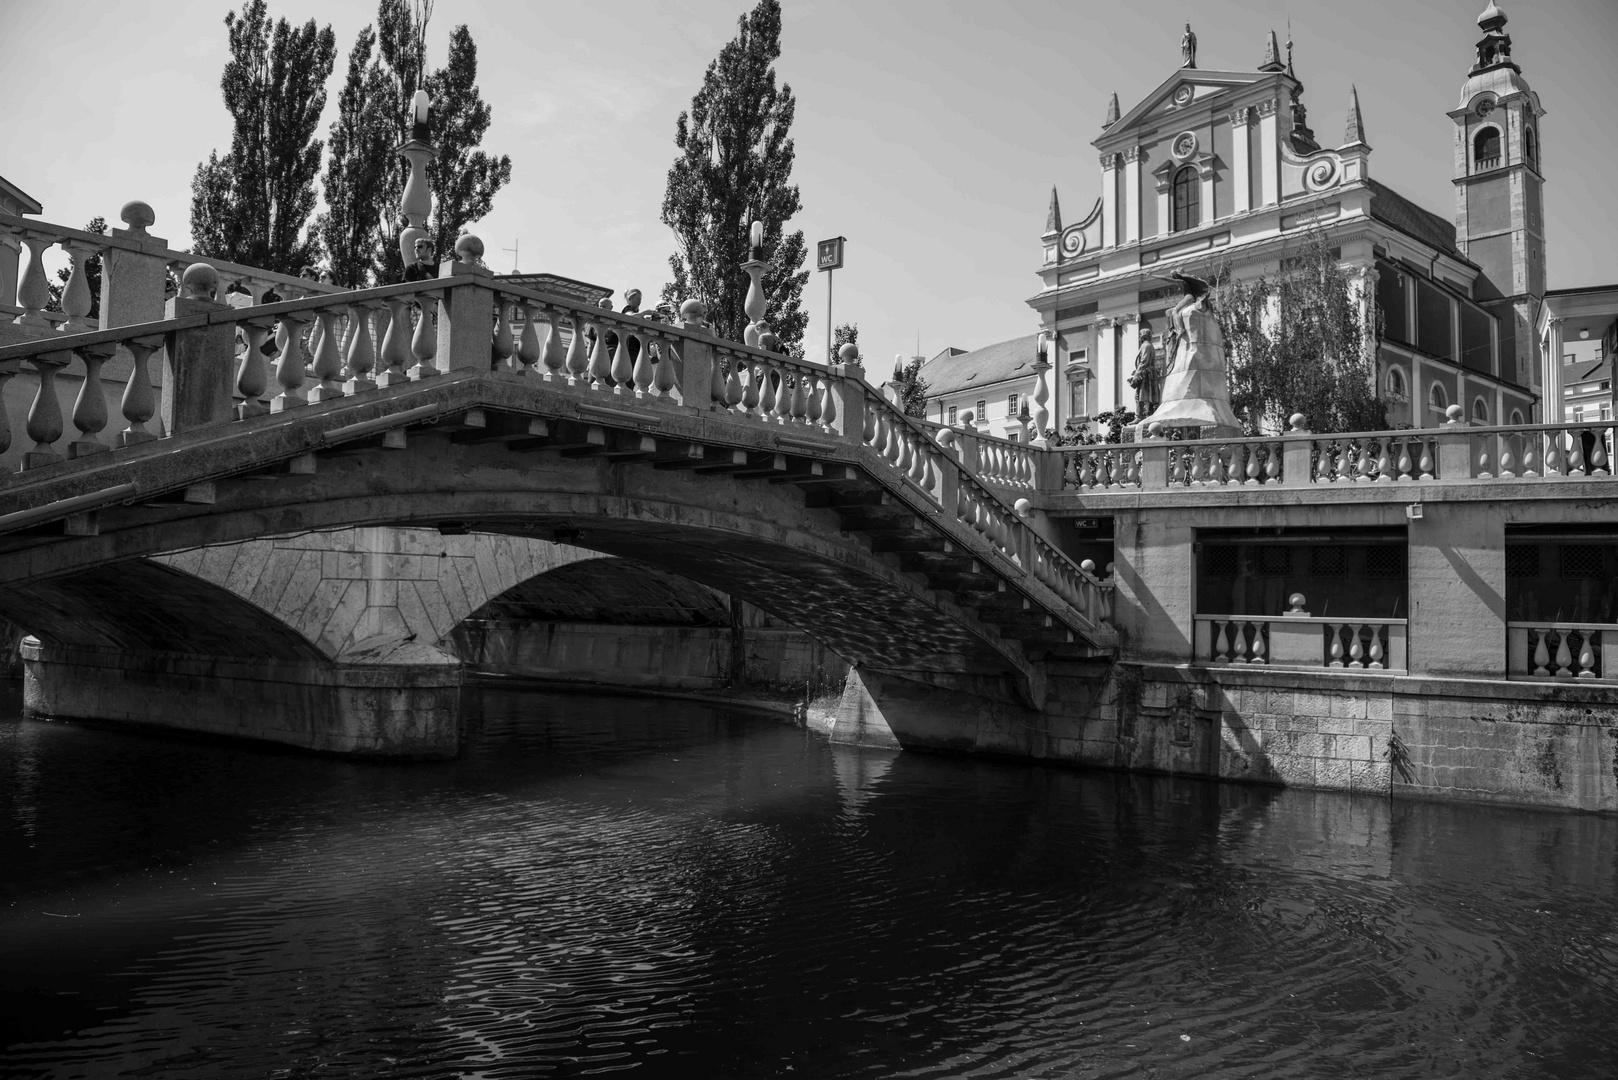 Lubljana - The triple bridge